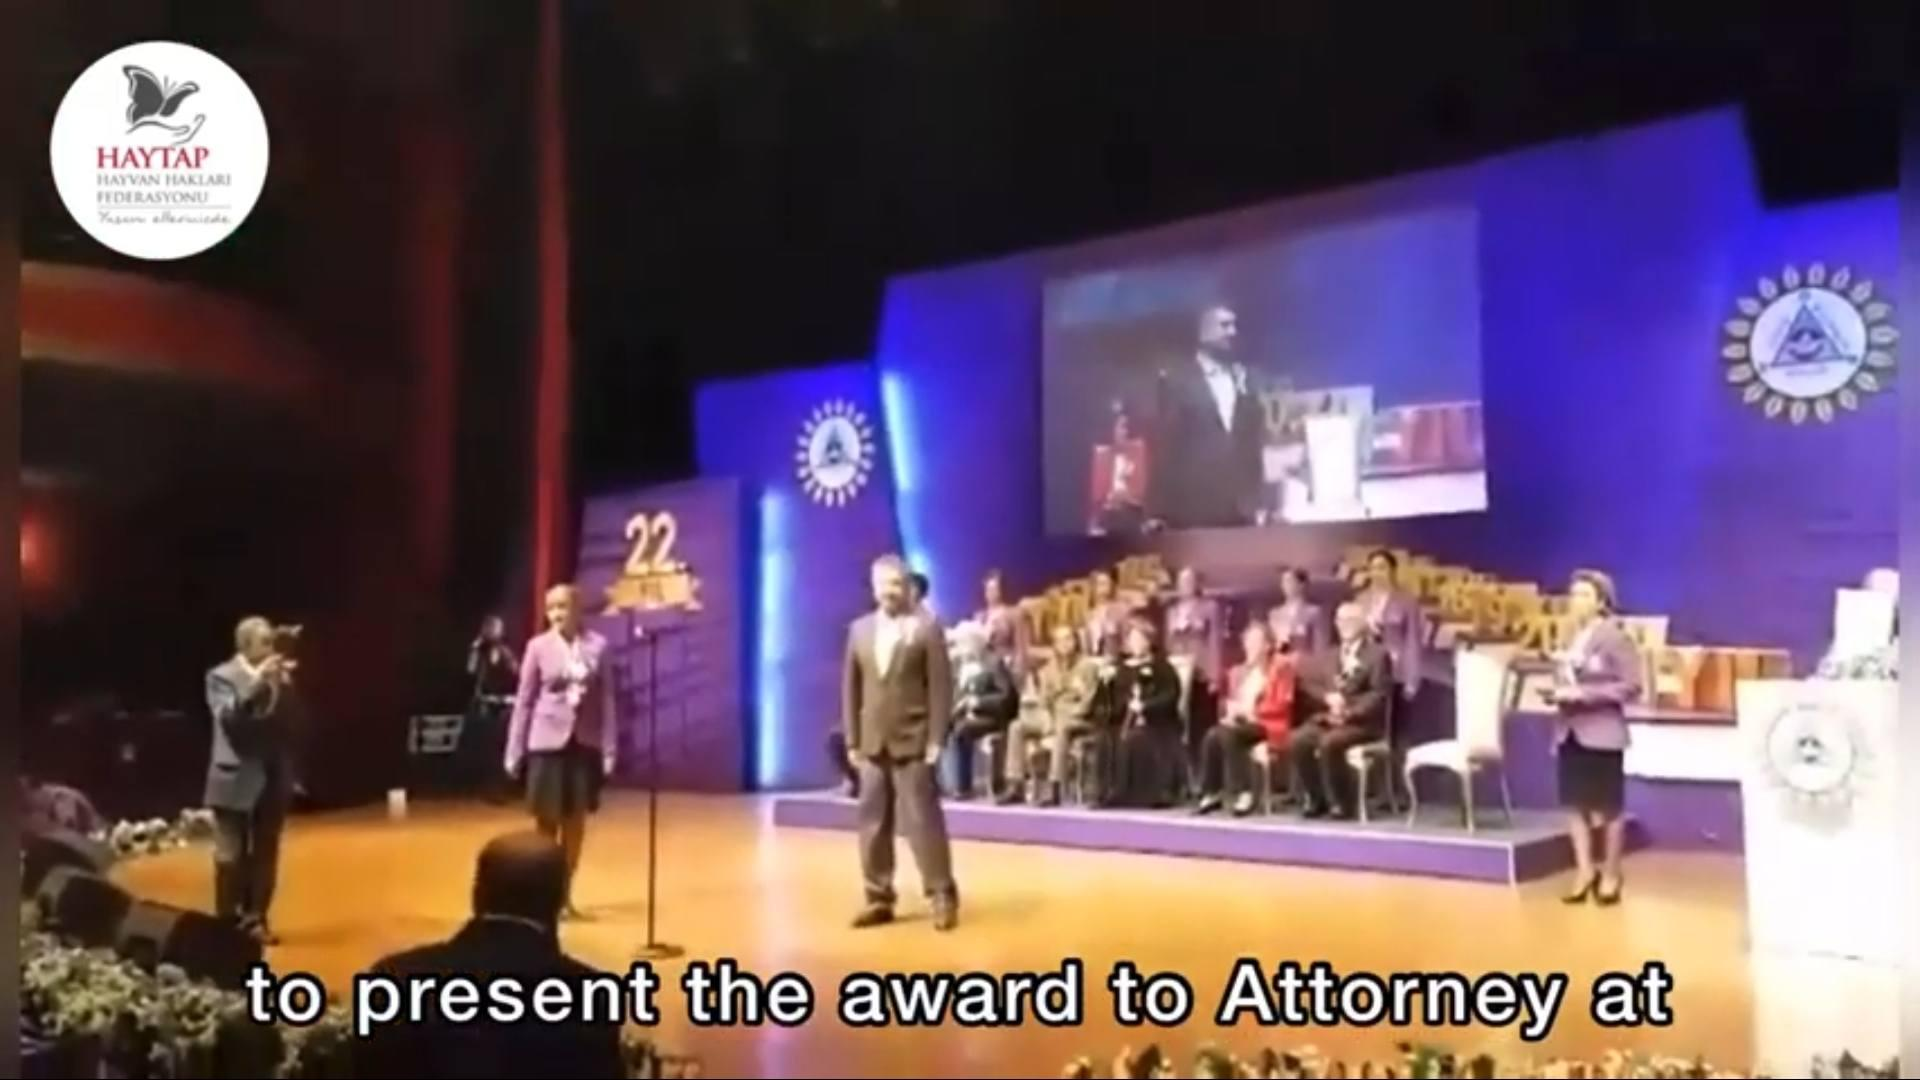 World Peace Award for Haytap